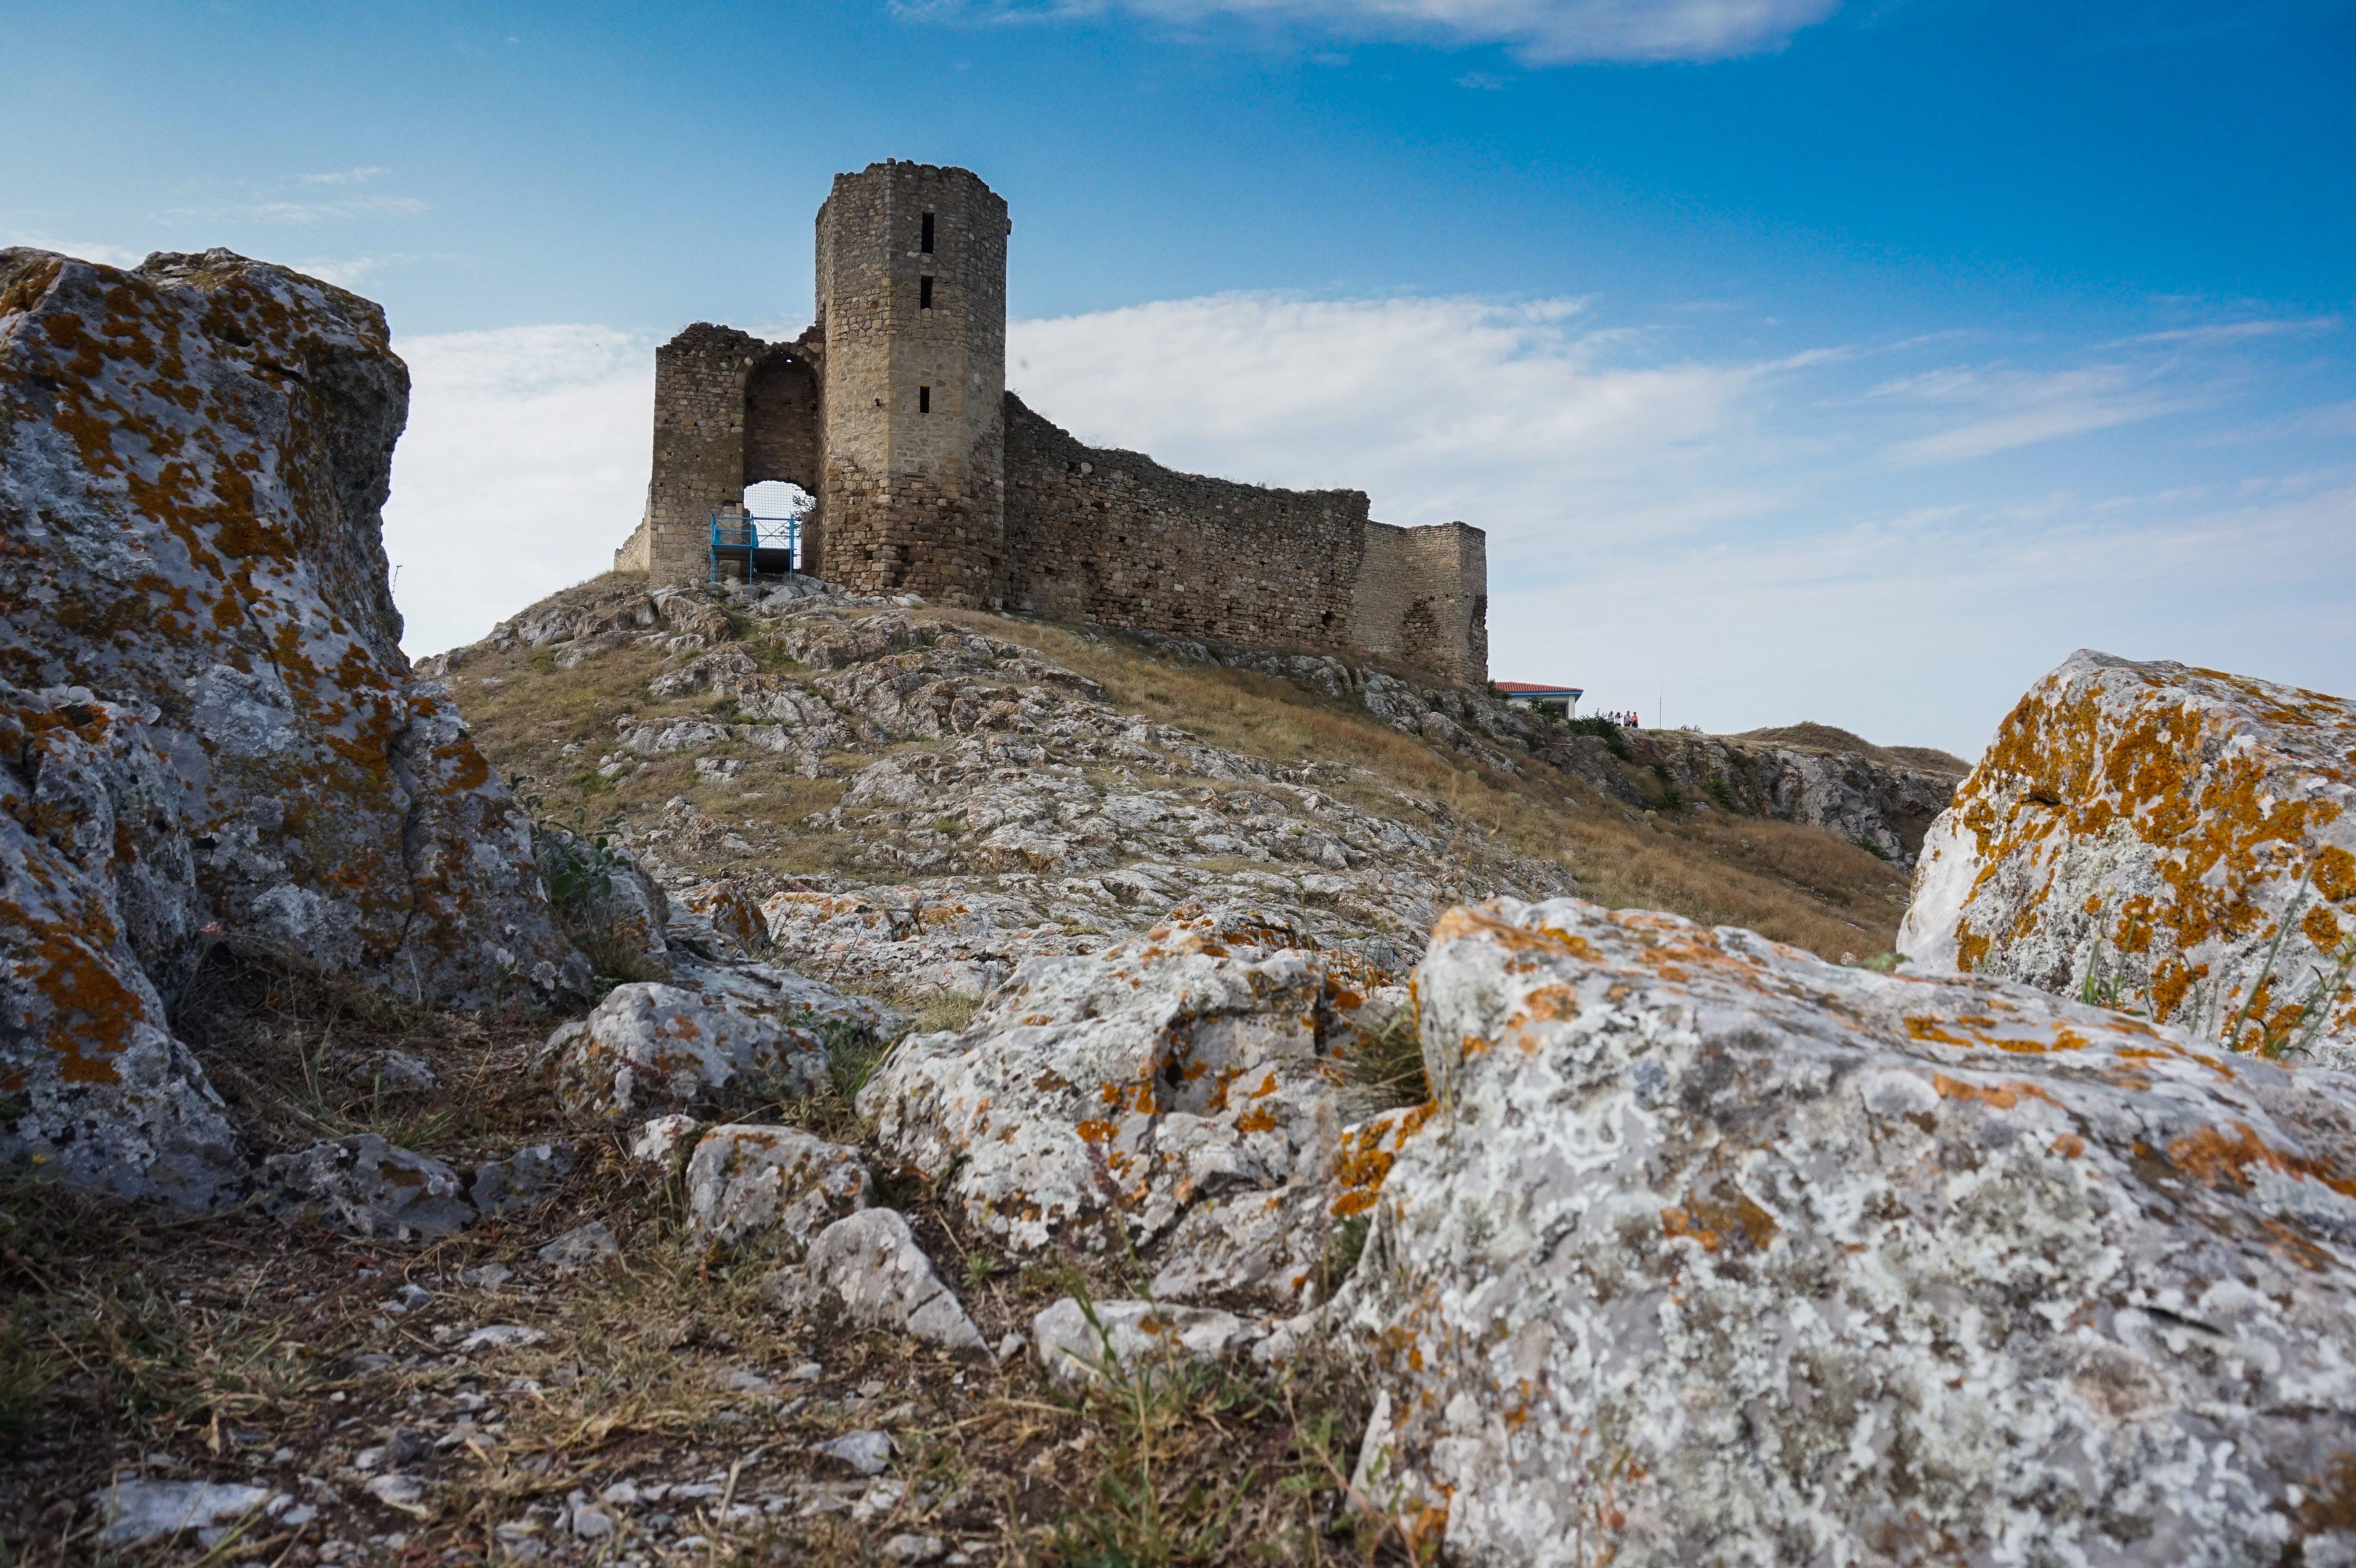 Gray Concrete Castle Under Blue and White Sky